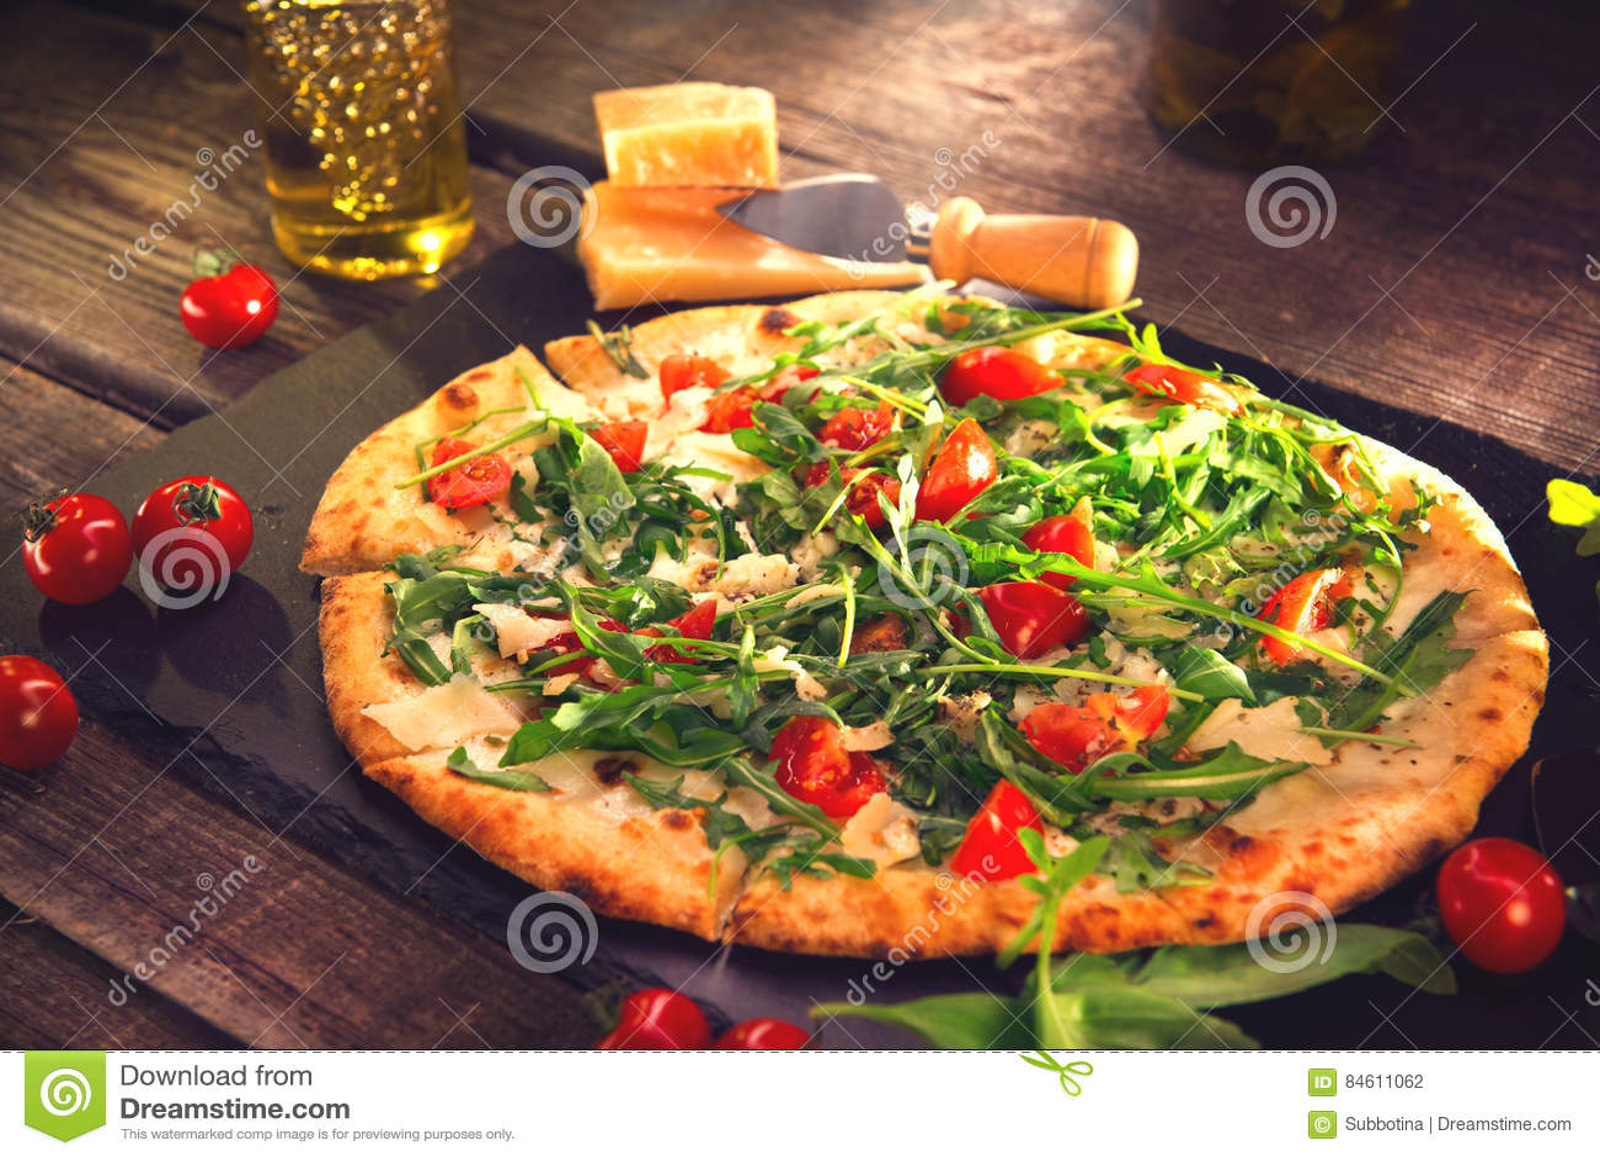 Pizza Caprese with arugula, cheese, yoghurt and cherry tomatoes